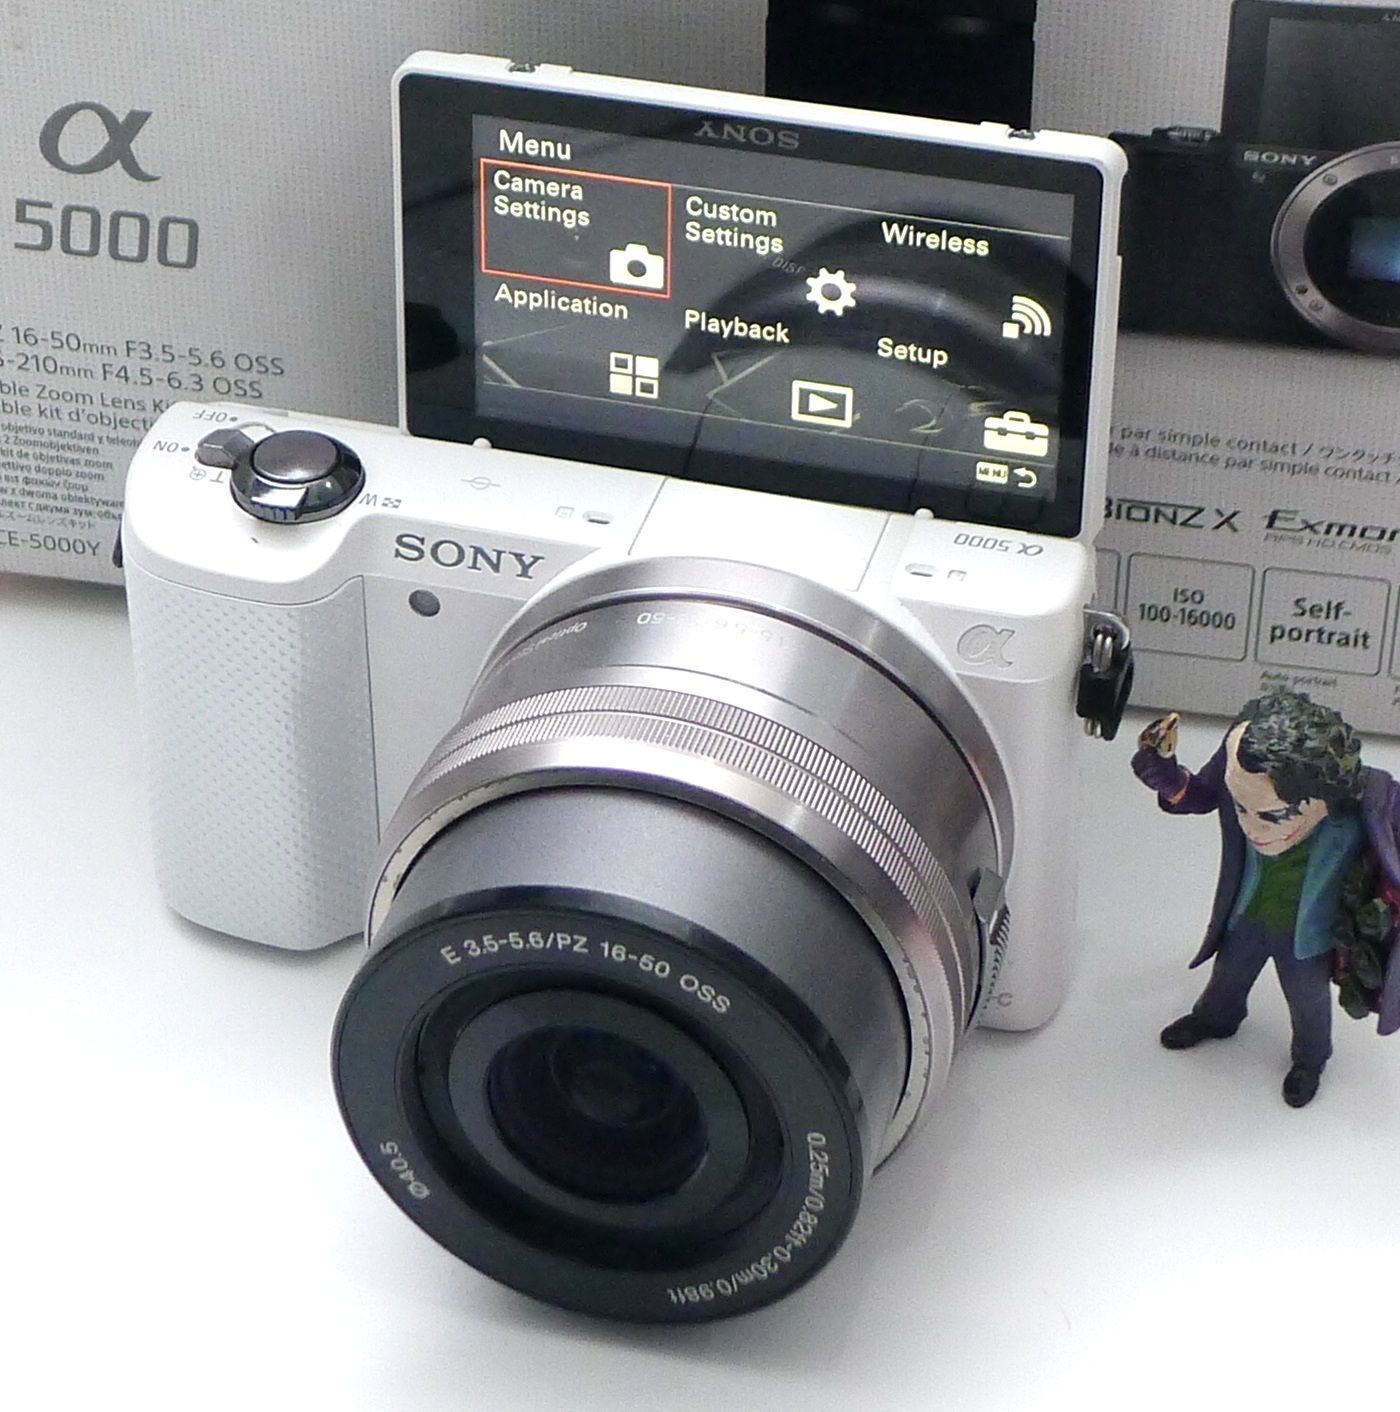 Kamera Mirrorless Sony A5000 Built In Wifi Fullset Jual Beli